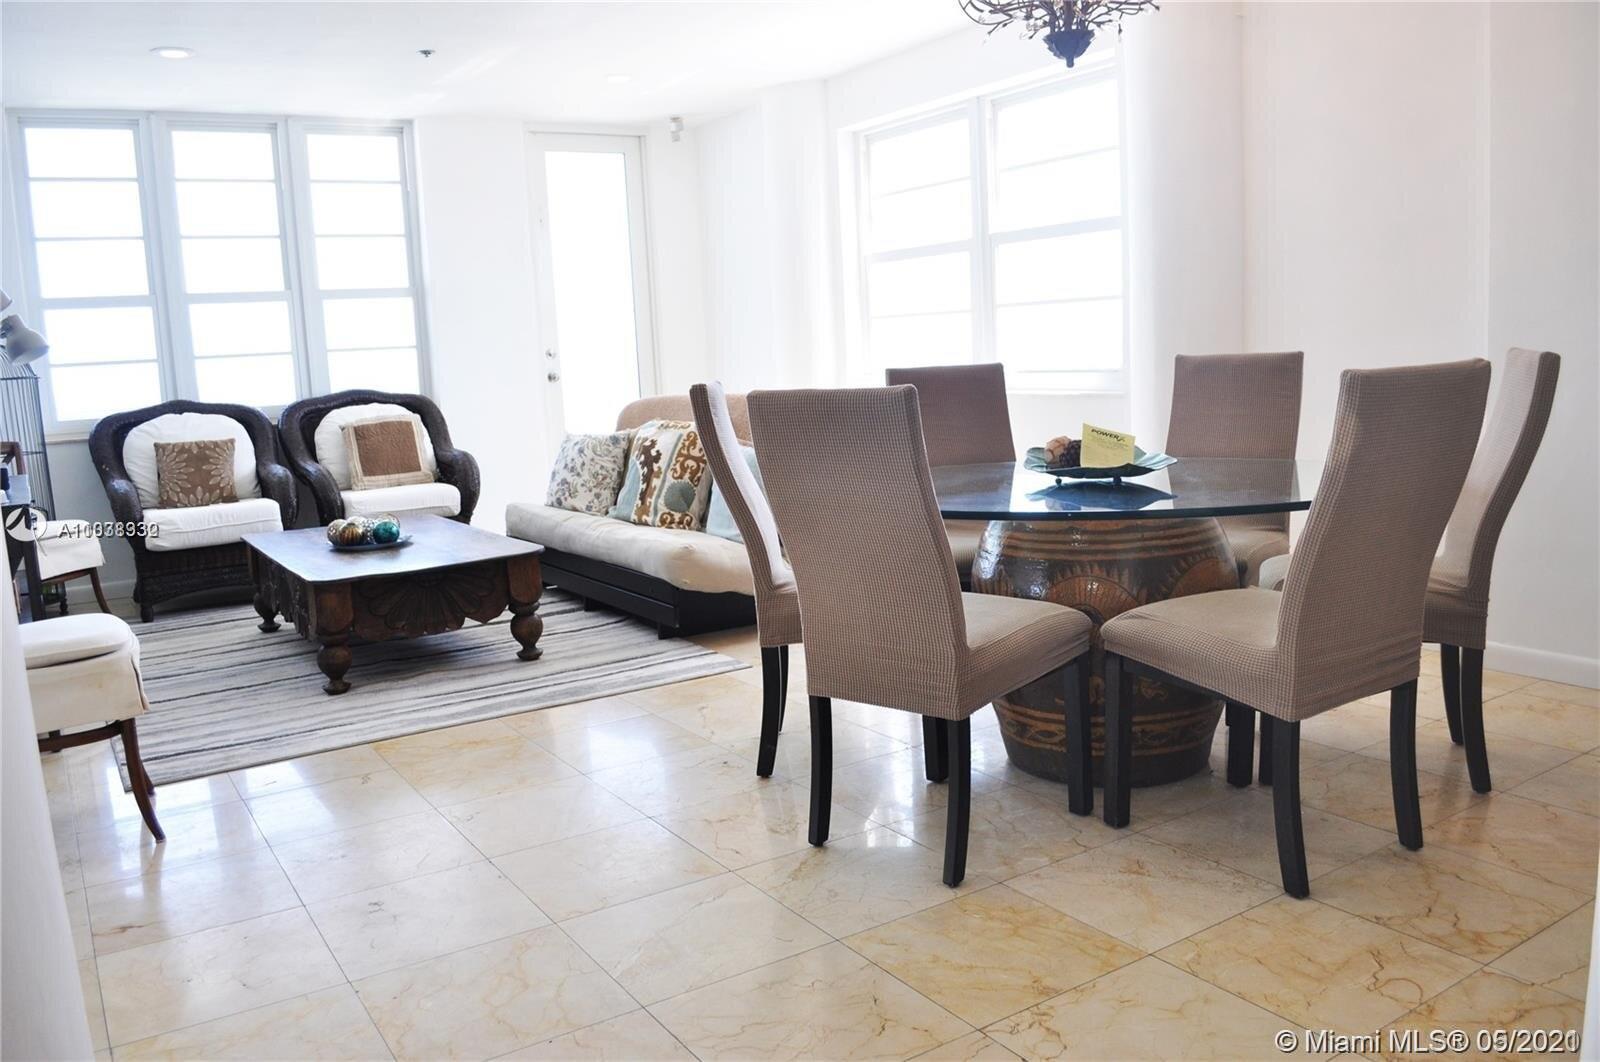 Decoplage #1621 - 100 Lincoln Rd #1621, Miami Beach, FL 33139